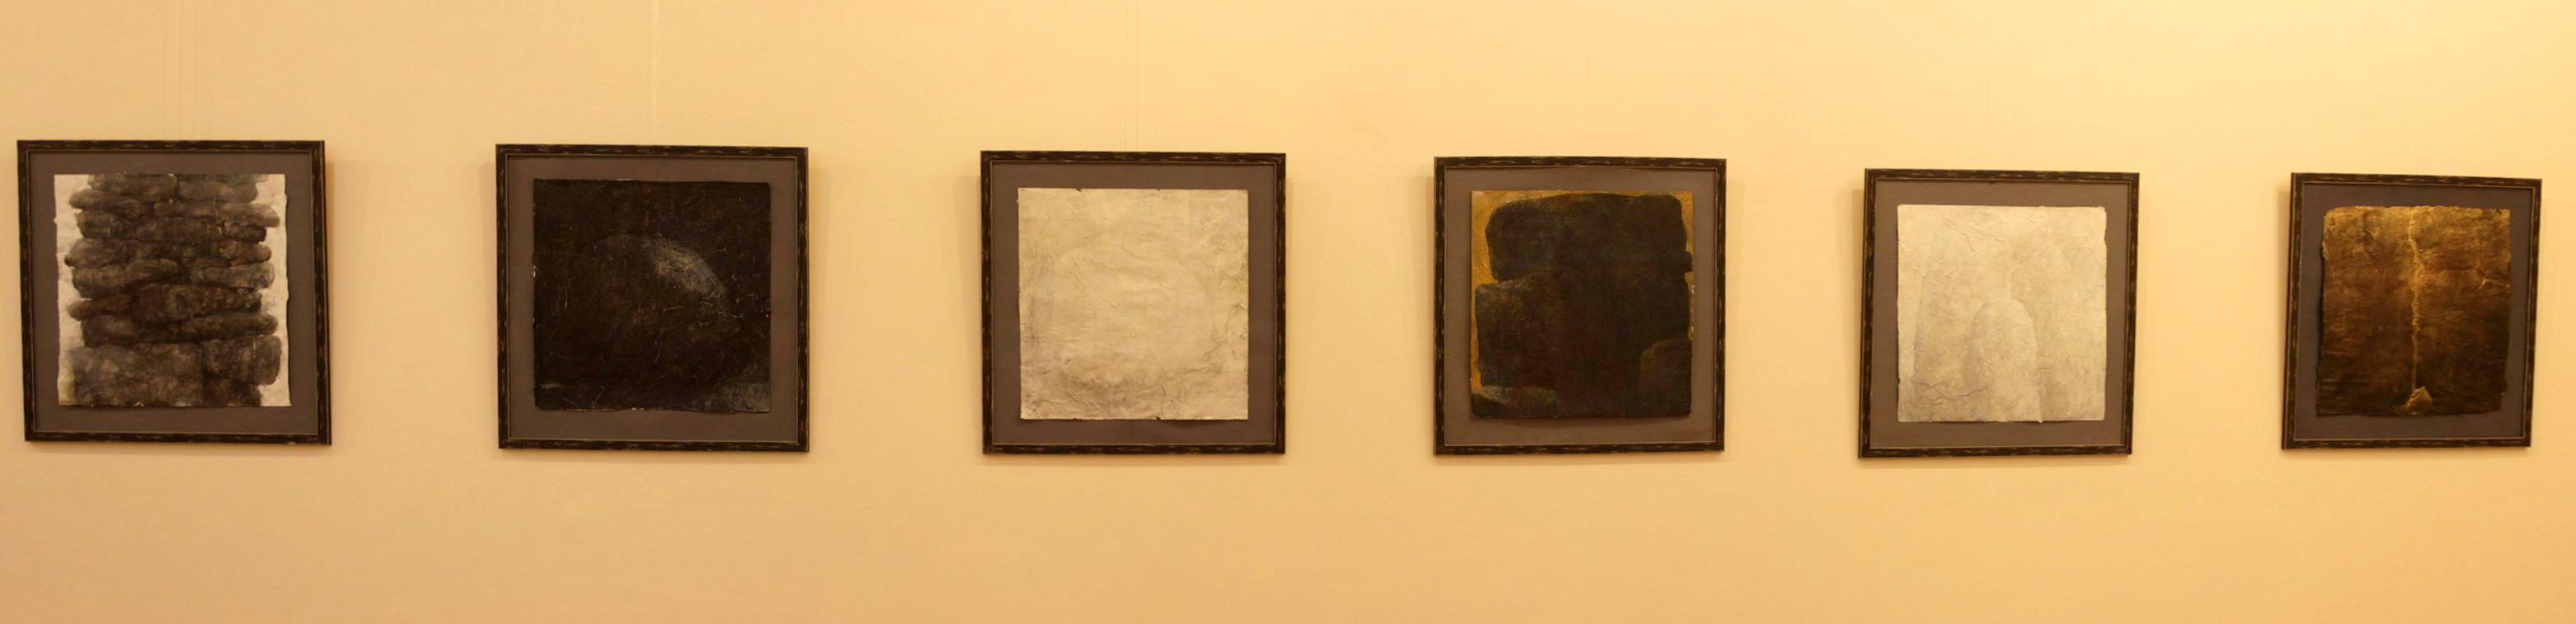 Алексей Дмитриев. Экспозиция работ (2)